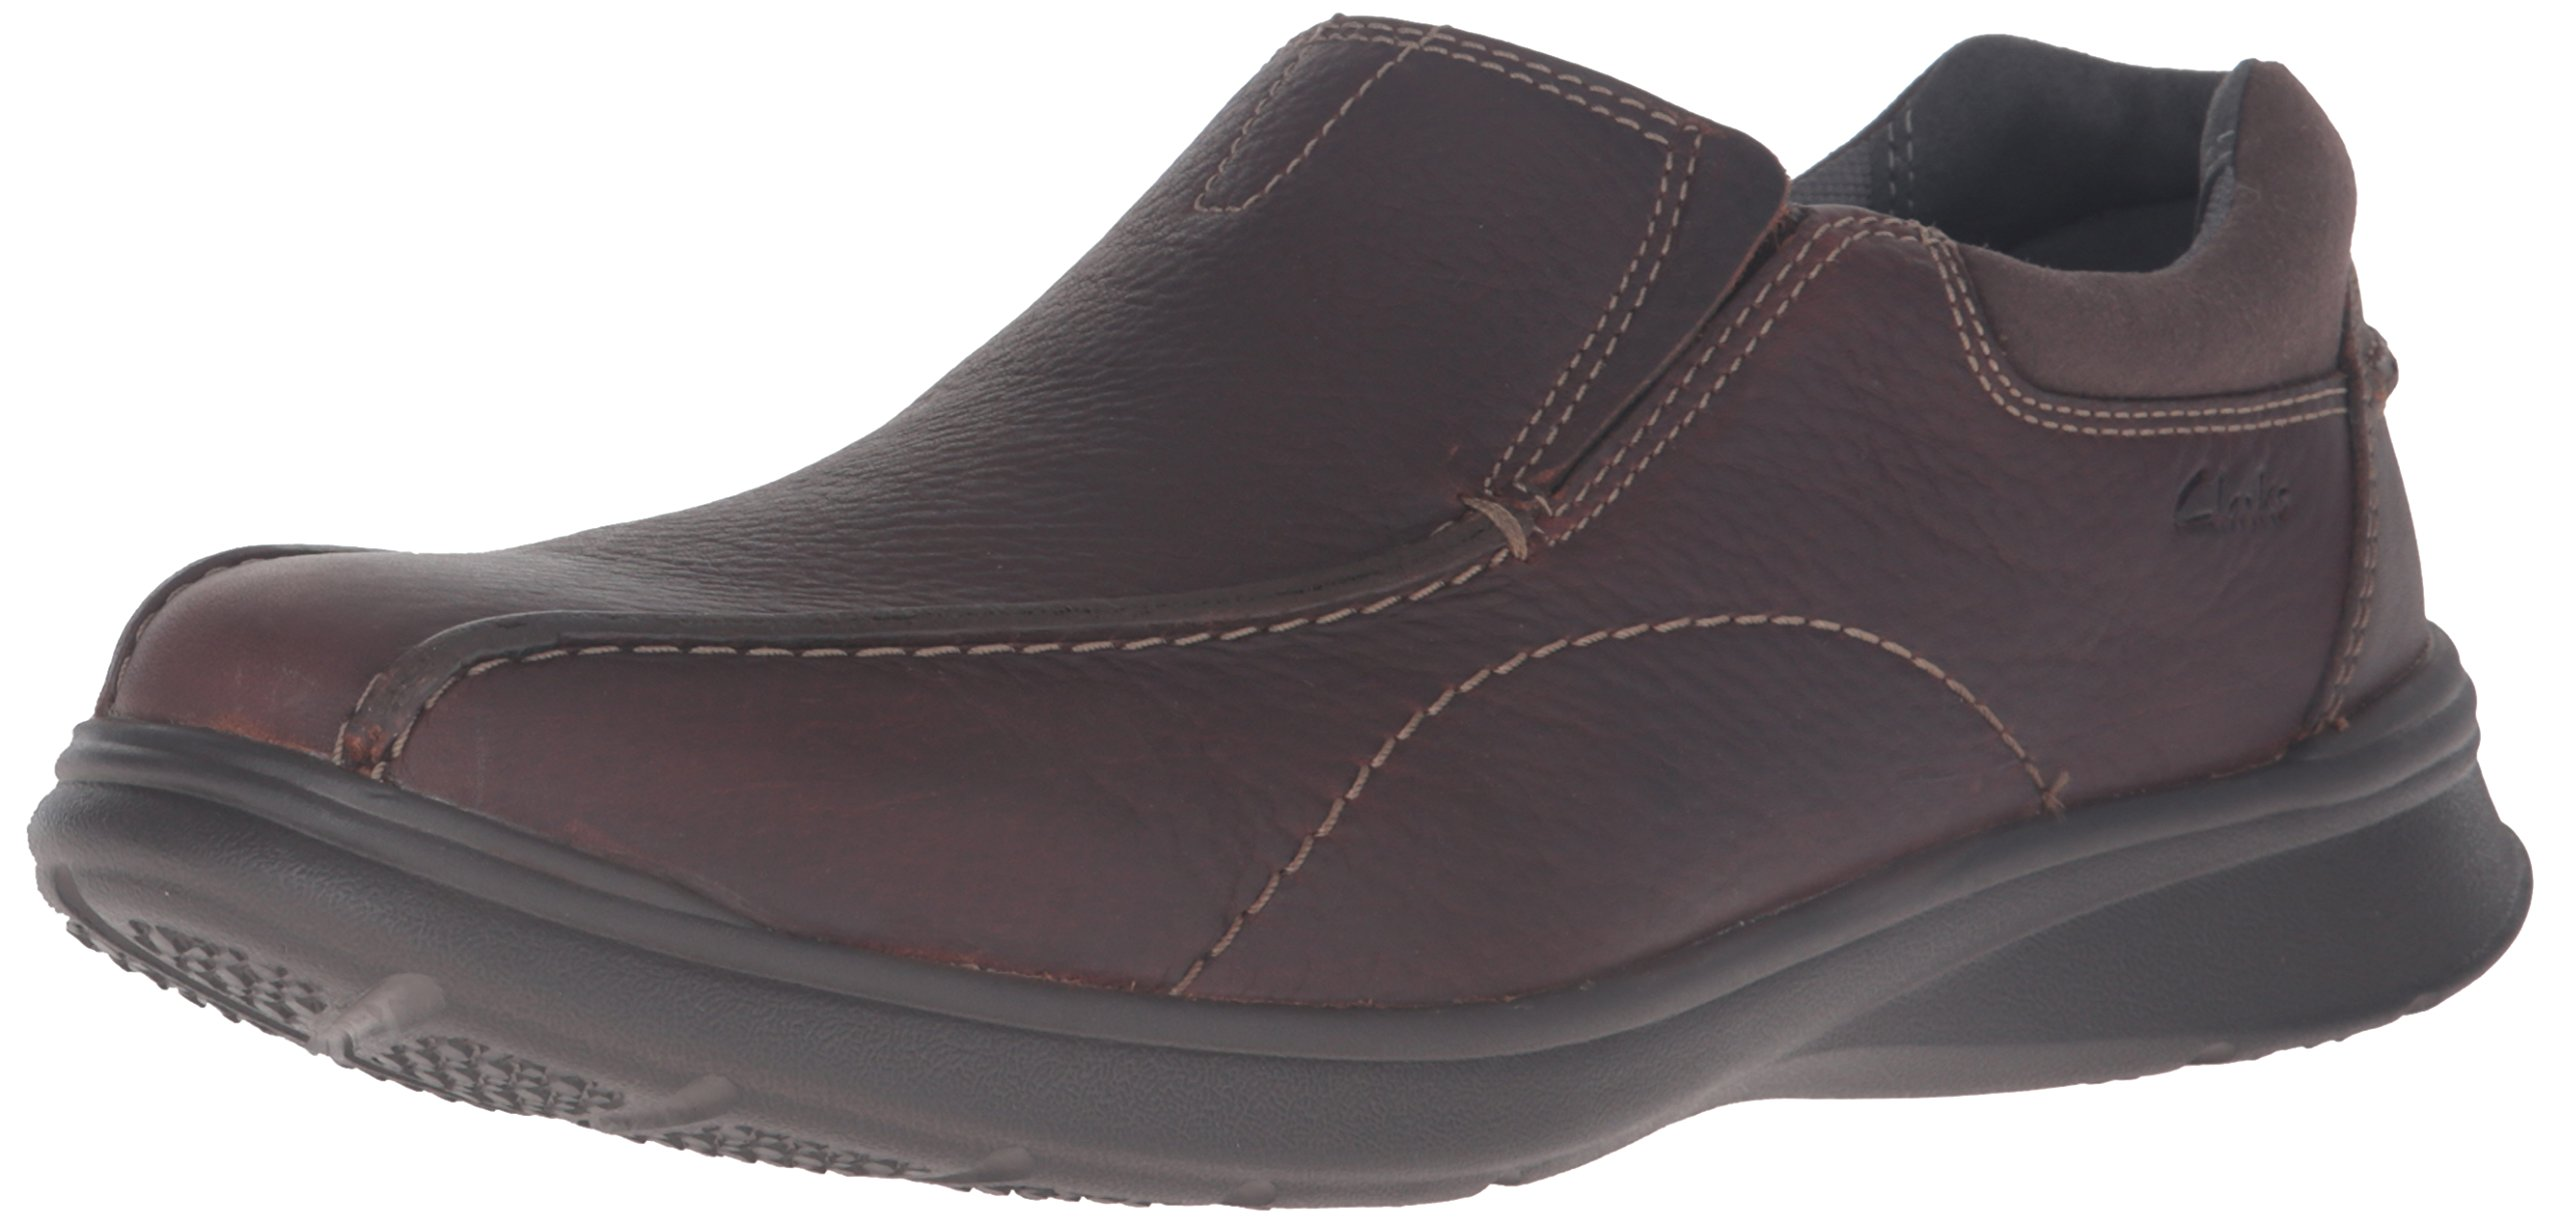 Clarks Men's Cotrell Step Slip-on Loafer,Brown Oily,10.5 D - Medium